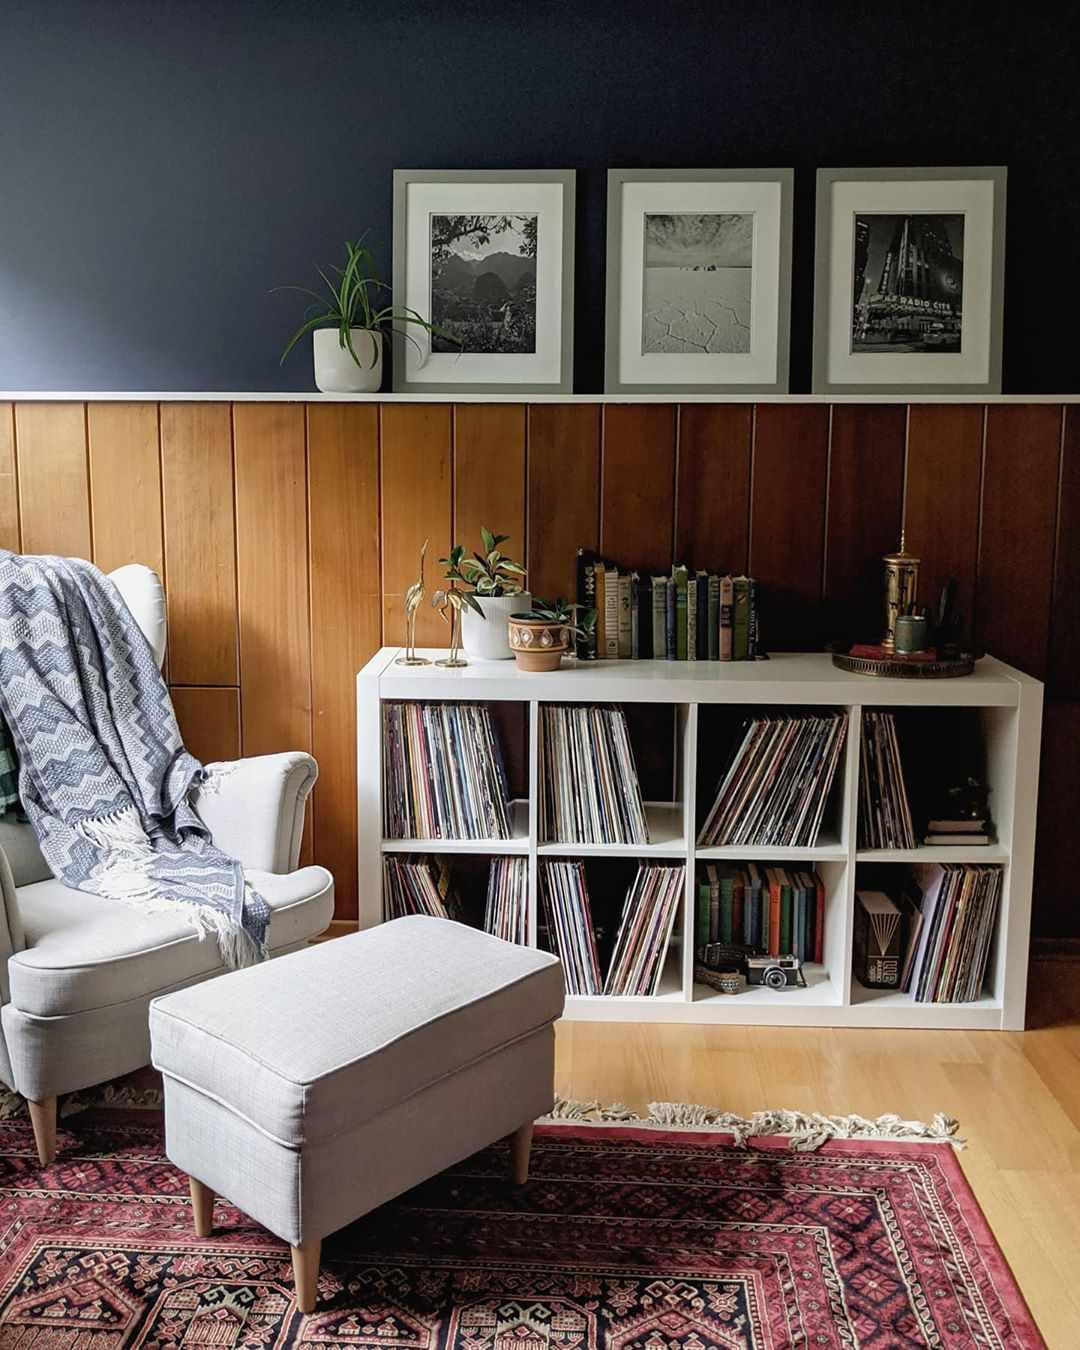 Reading corner with half paneled wood walls